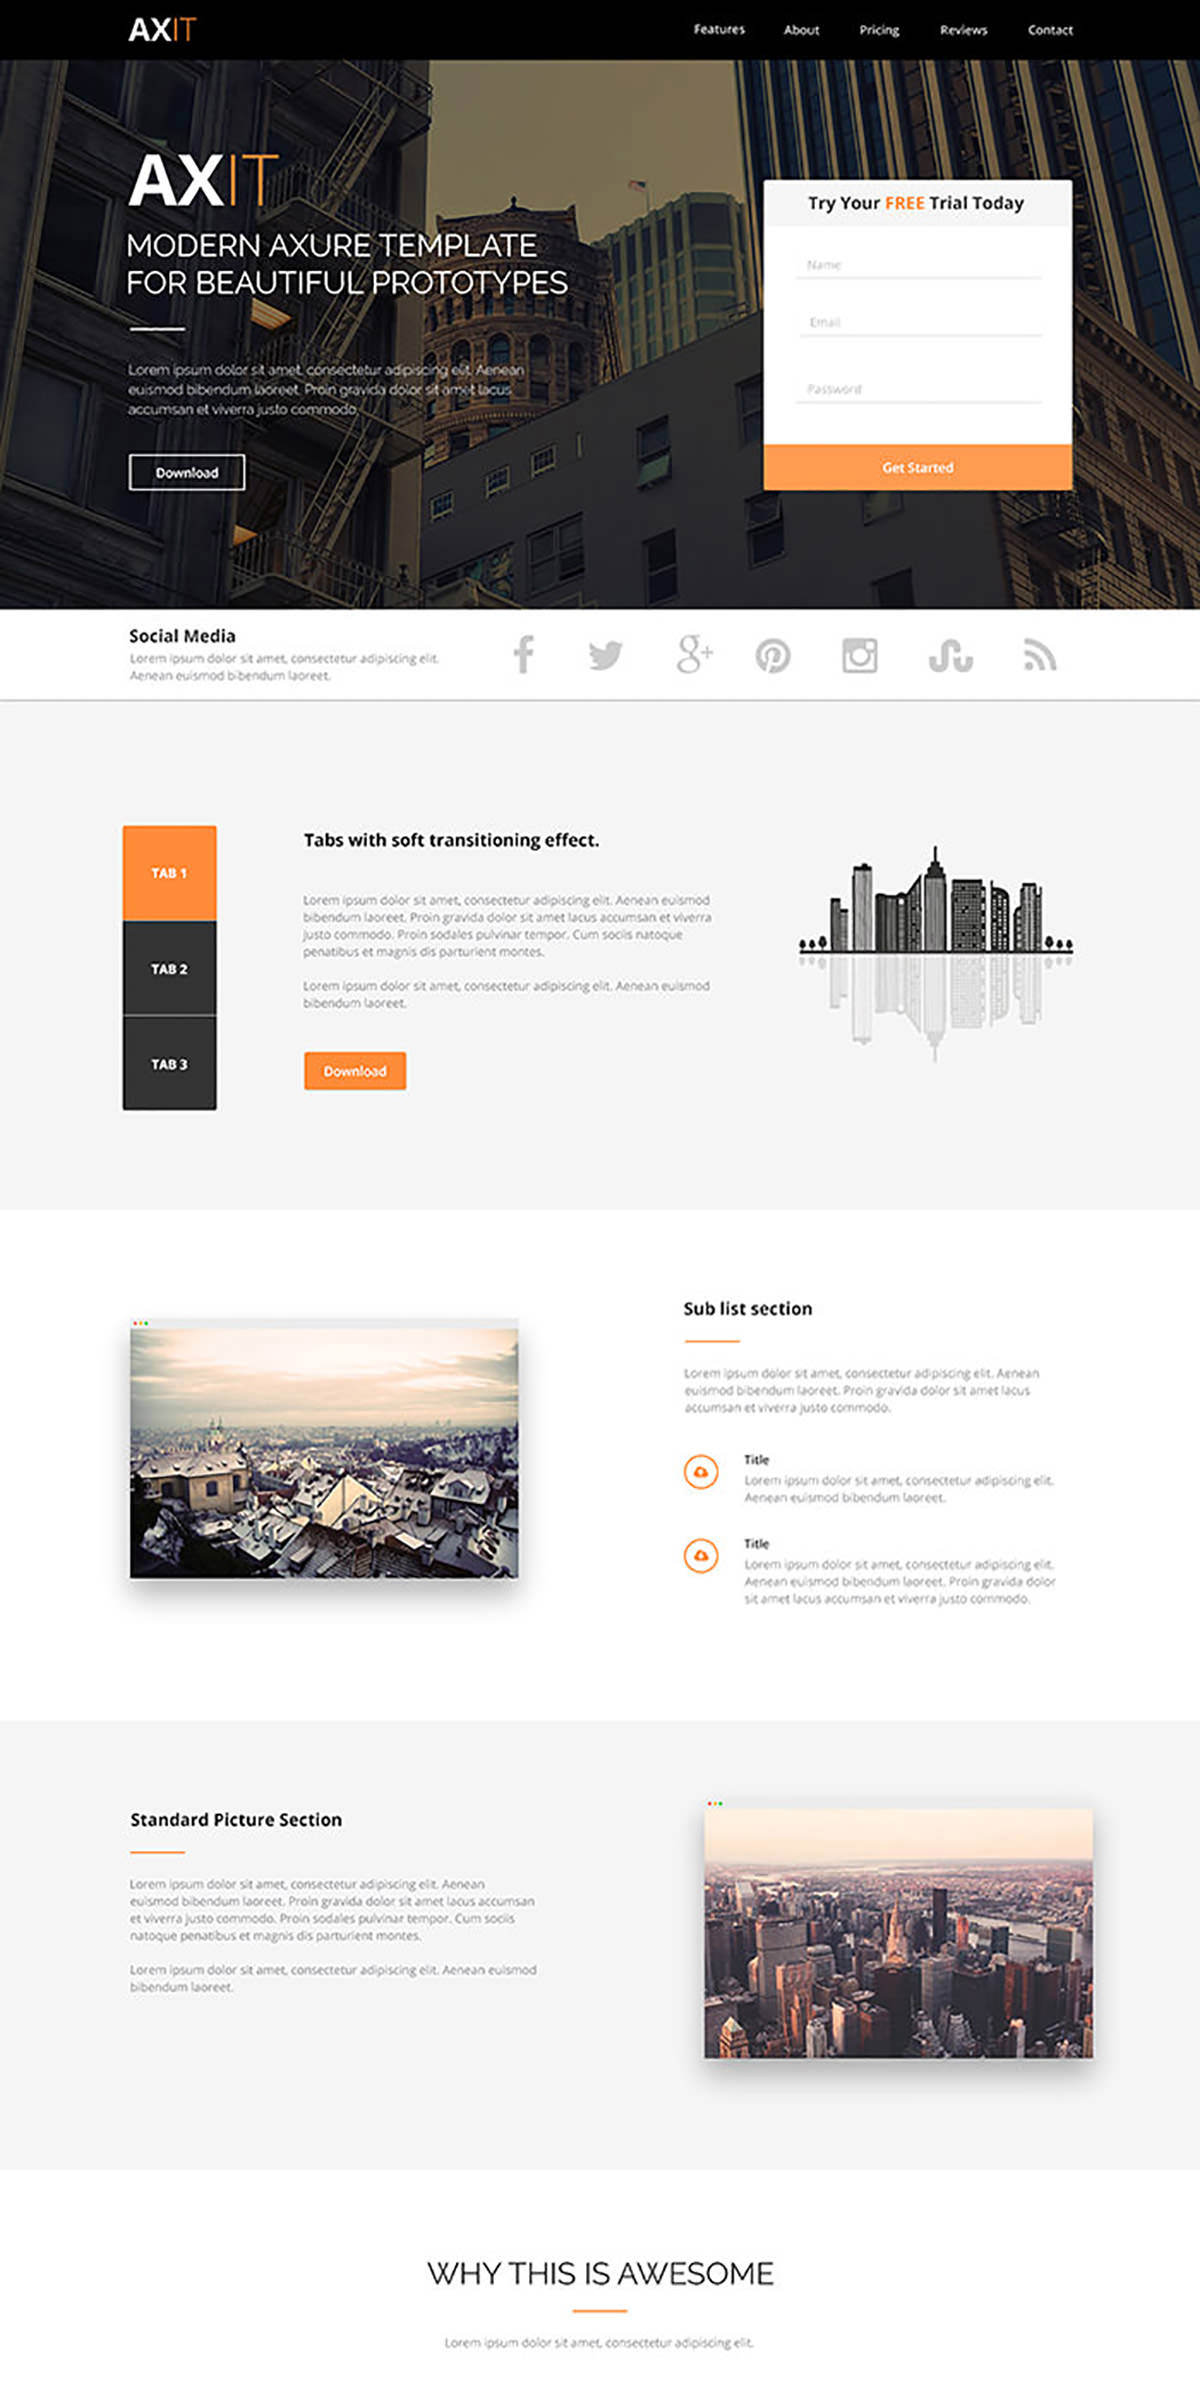 60 Free Beautiful Psd Website Templates To Download 2020 Hongkiat